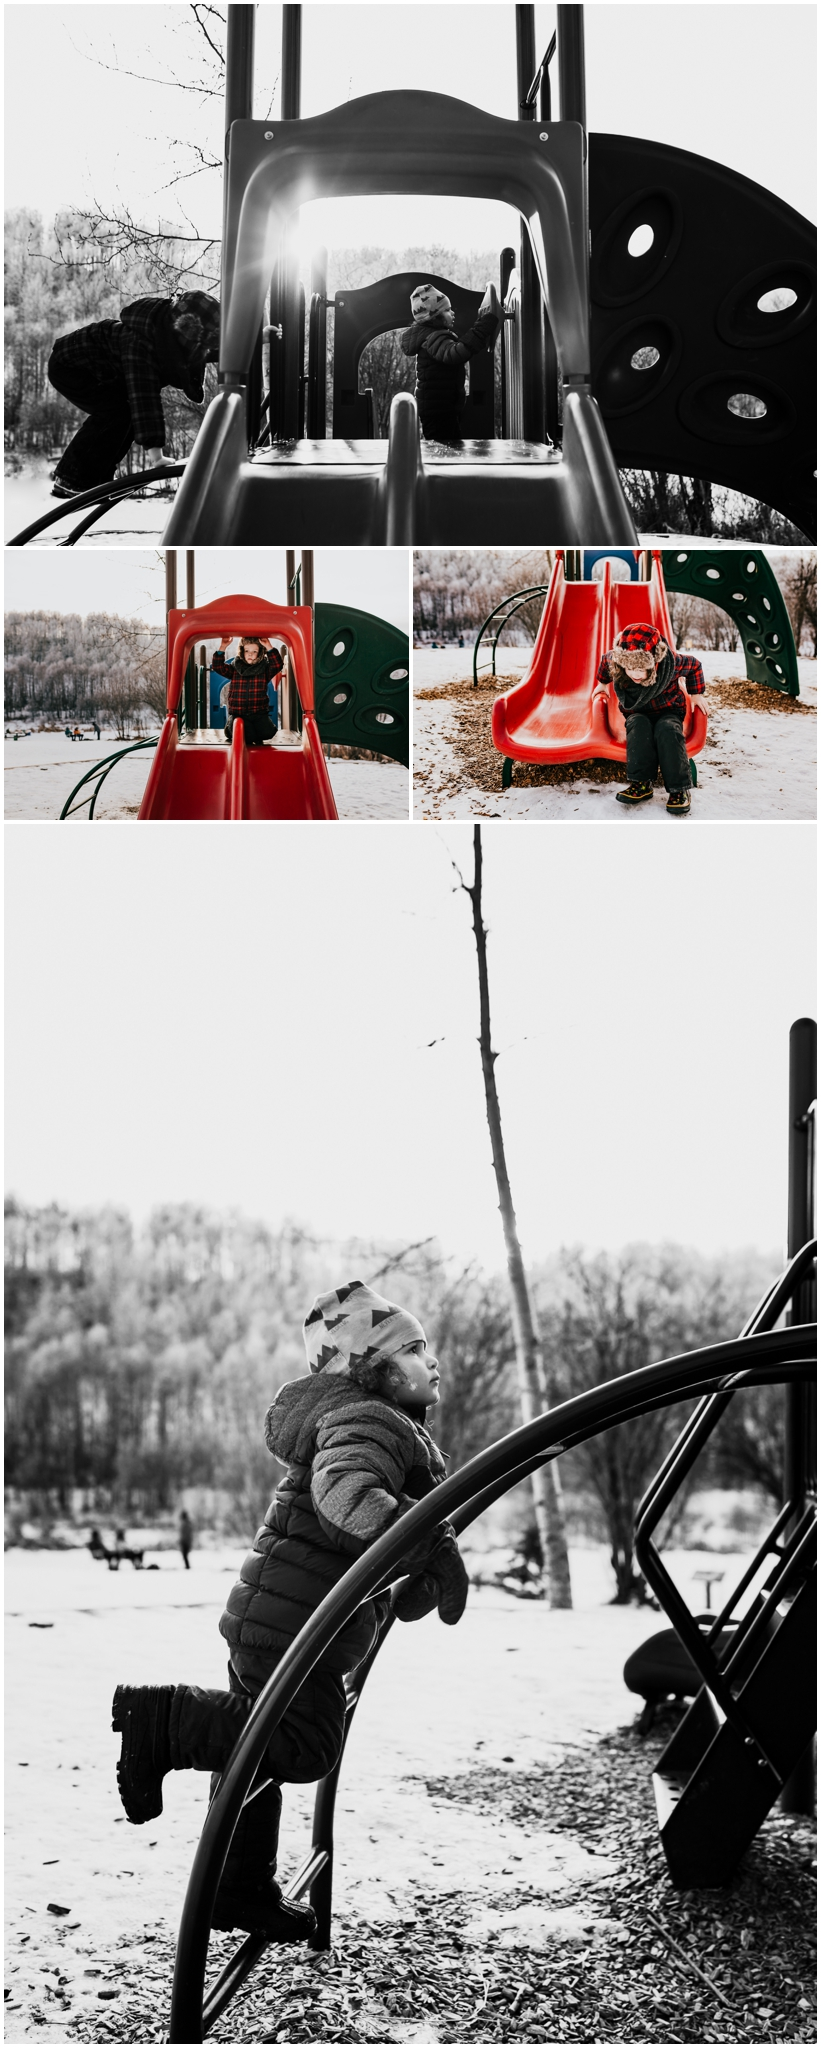 Edmonton Phogorapher - Kids at the playground - Lifestyle Photography - Camping playground